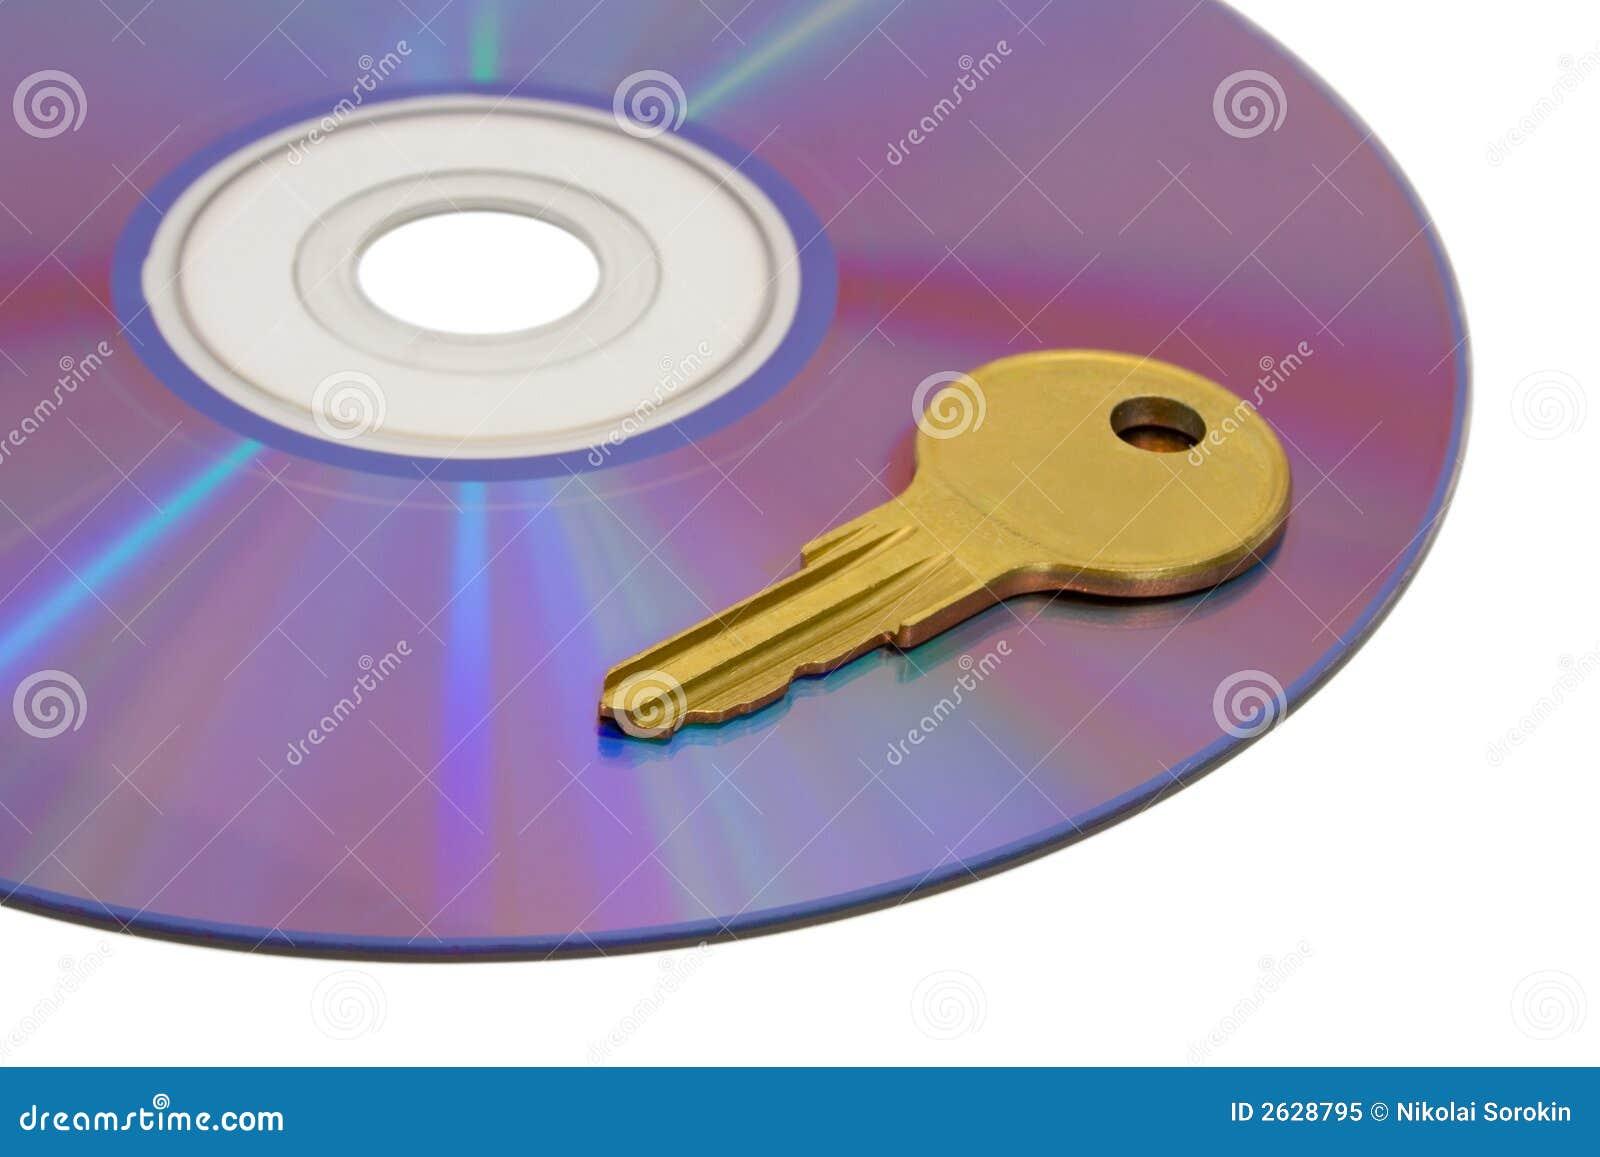 Key on computer cd